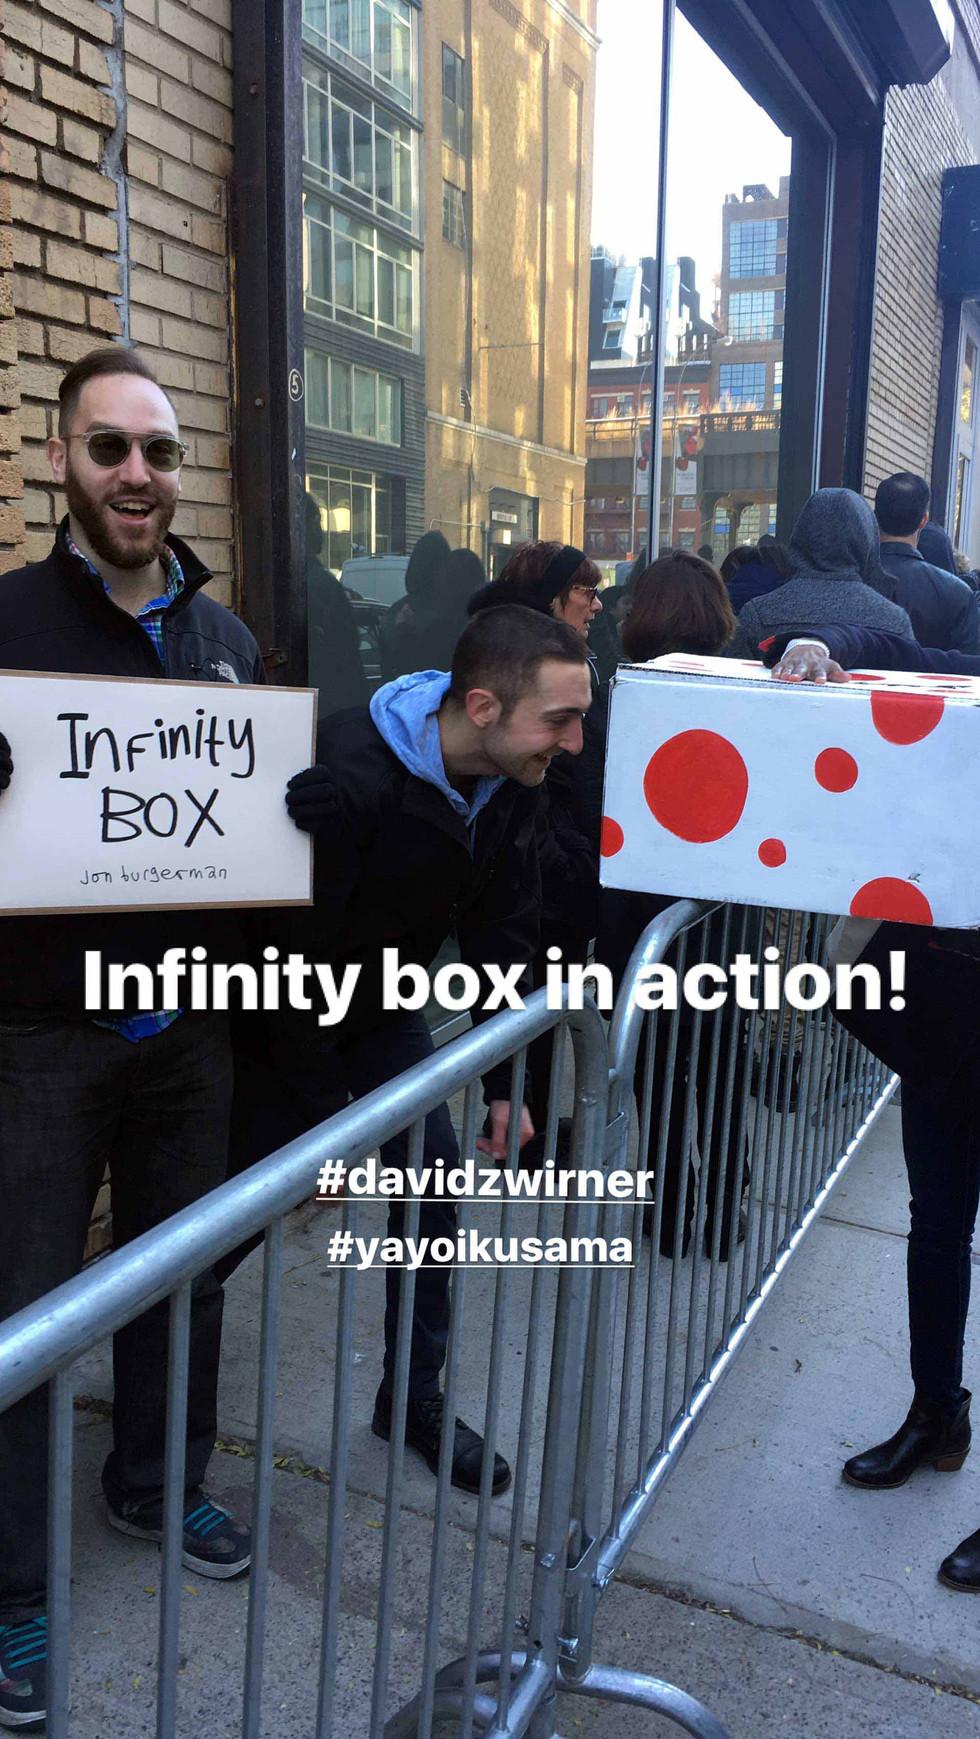 infinity-box-05jpg